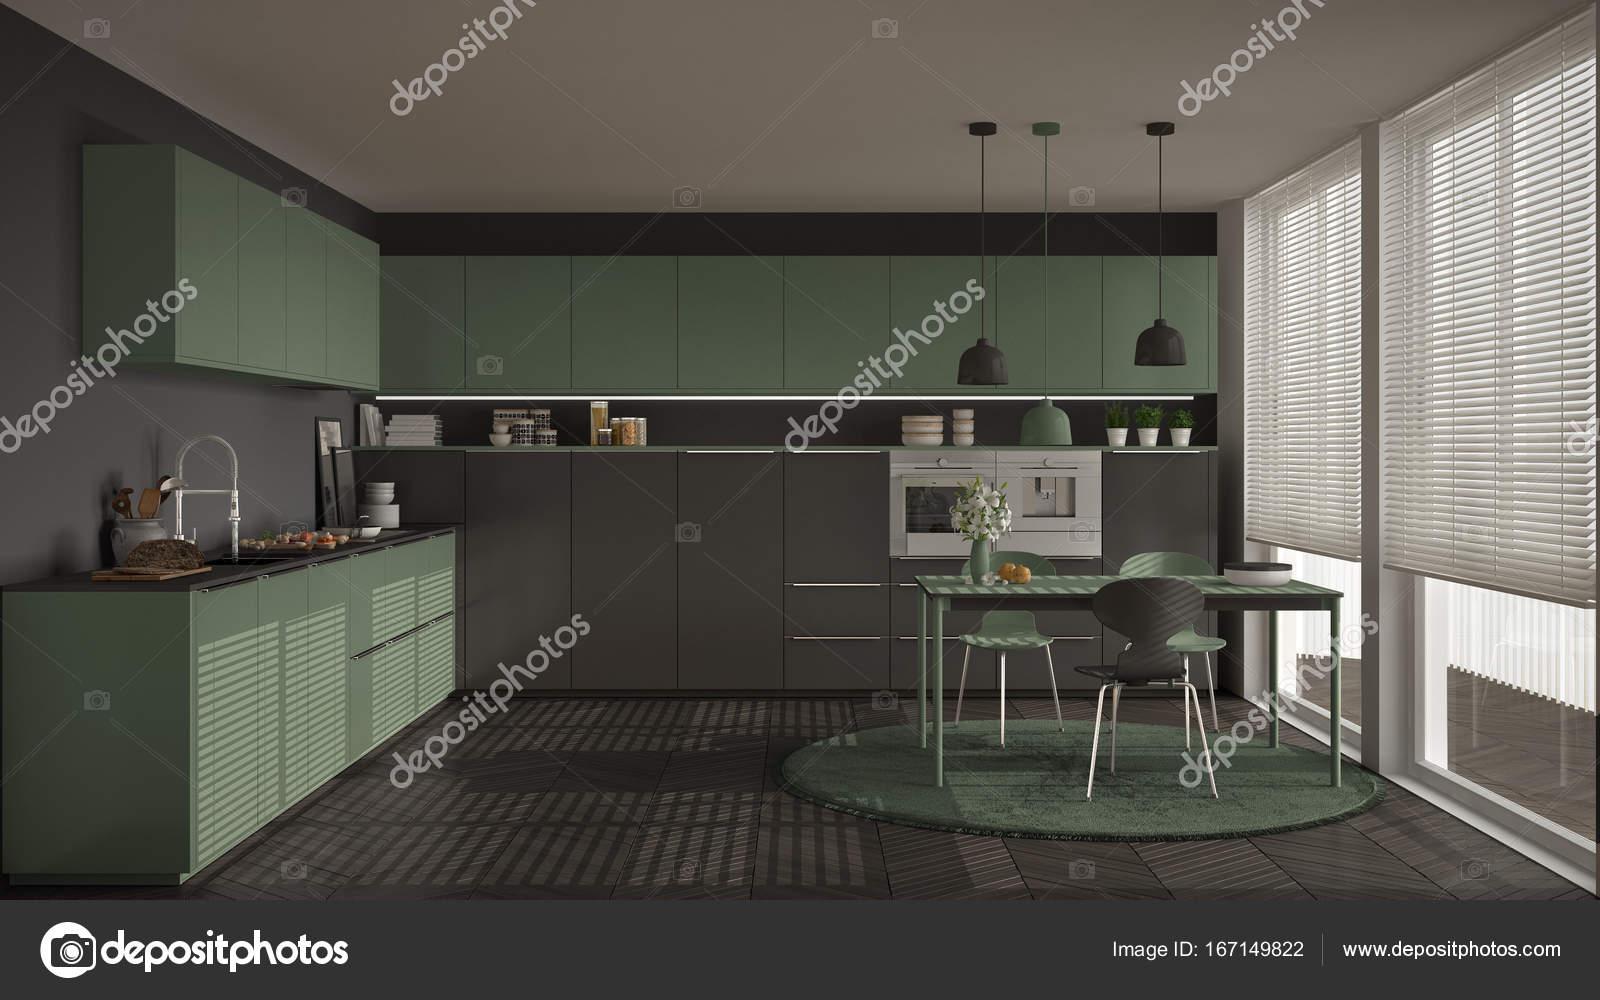 large kitchen table tall wall cabinets 现代厨房的桌子和椅子 大窗户和herringbon 图库照片 c archiviz 167149822 现代的厨房桌子和椅子 大窗户和人字镶木地板 灰色和桃金娘绿色简约的室内设计 照片作者archiviz